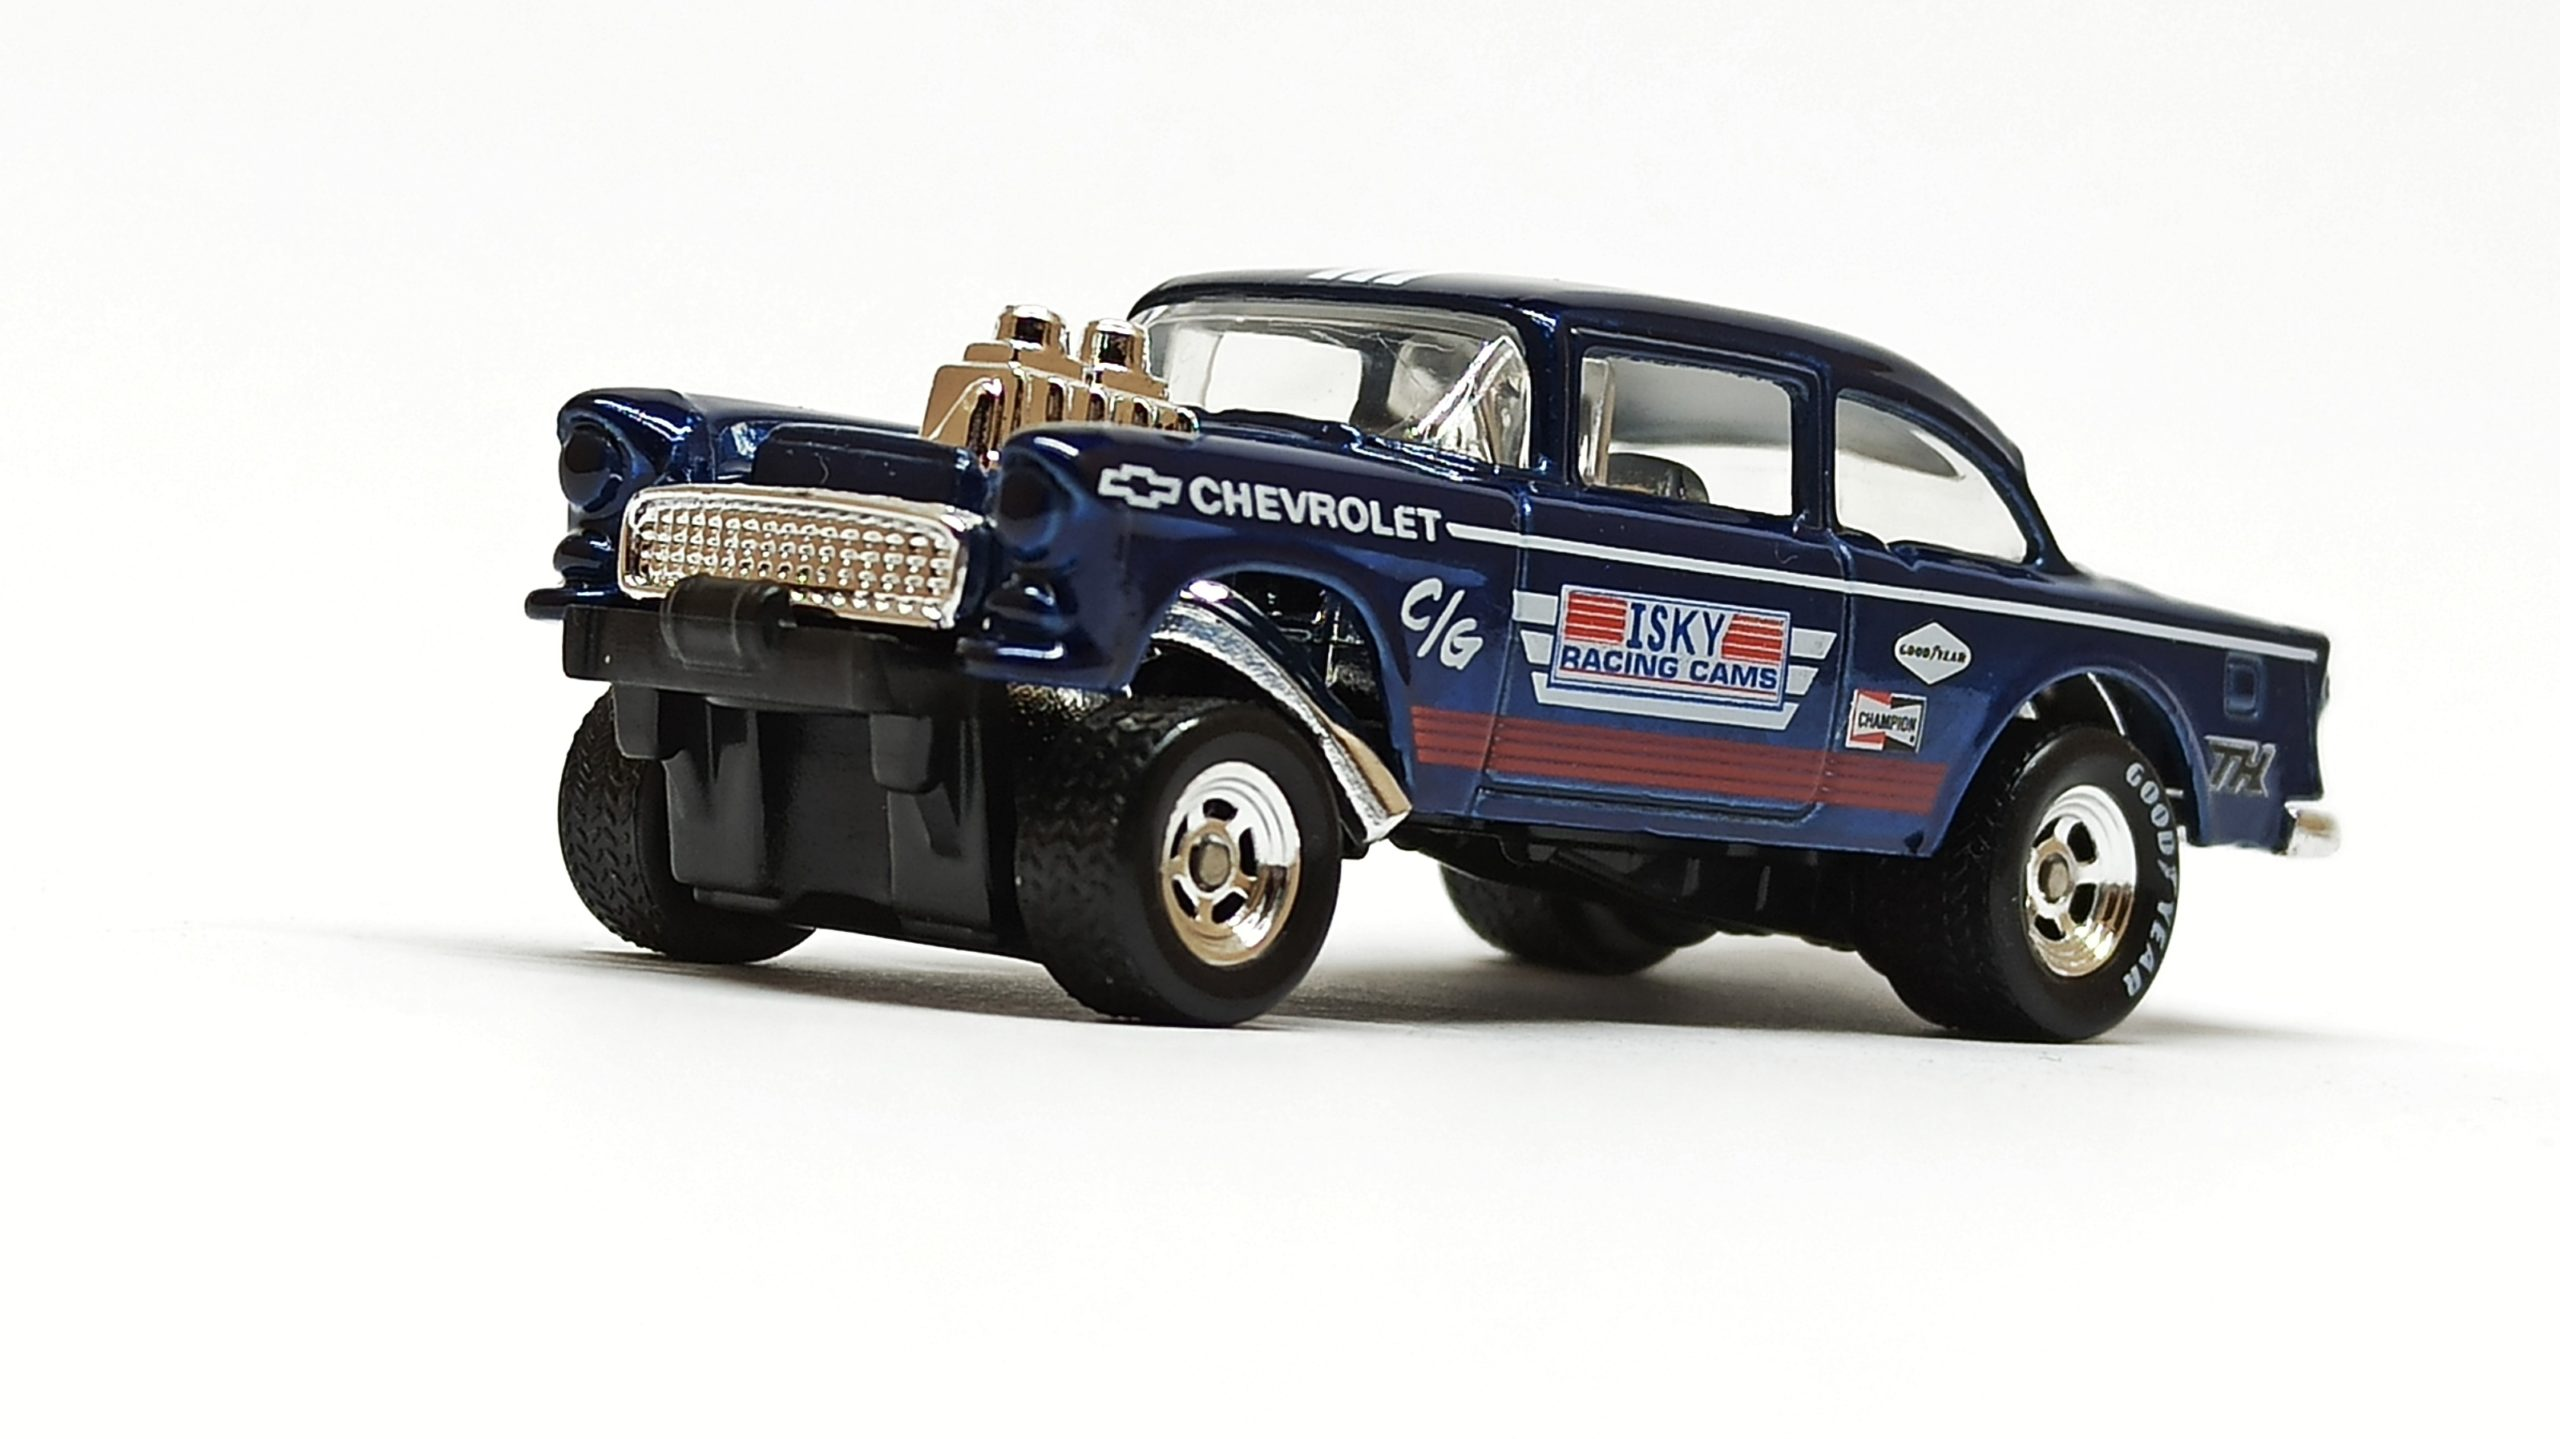 Hot Wheels '55 Chevy Bel Air Gasser (BFF38) 2014 (241/250) HW Workshop: HW Performance spectraflame dark blue Super Treasure Hunt (STH) side angle